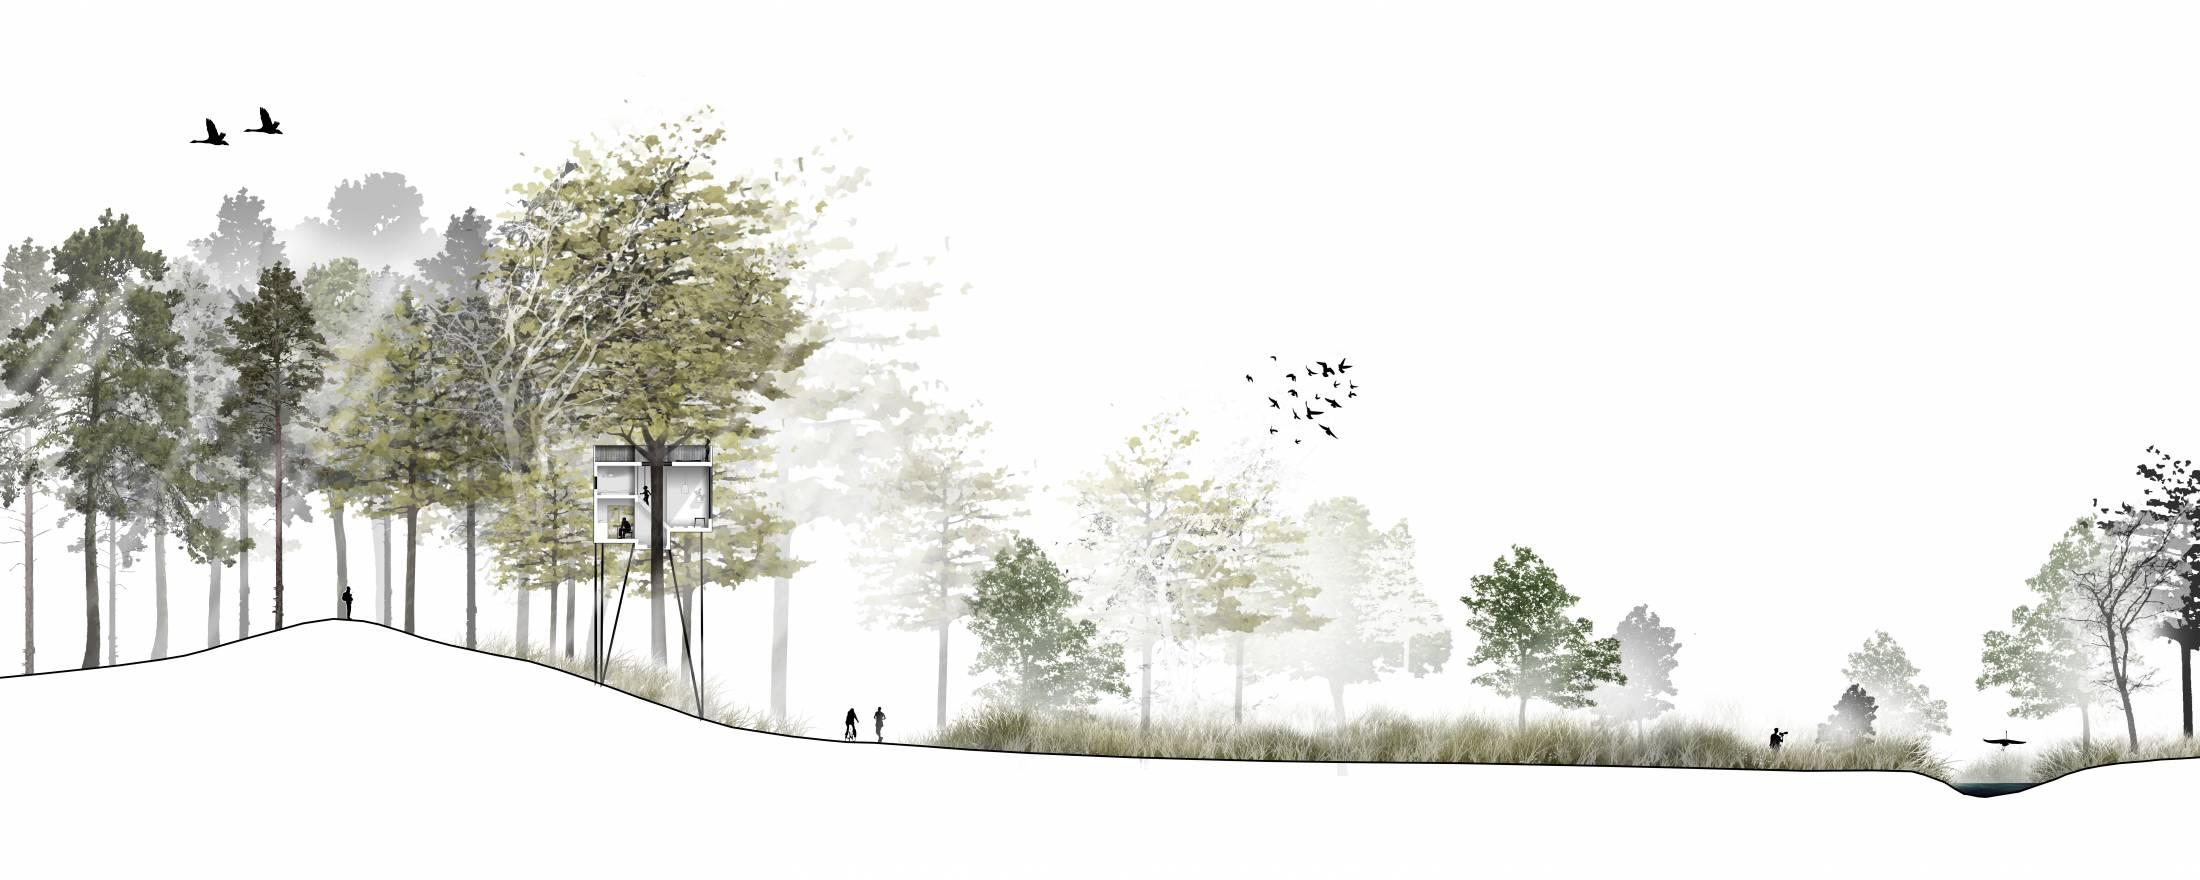 Treetop-Hotel_Denmark_lovtag_Architect-Sigurd-Larsen-axo-forest-Landscape-long-section-1100x440@2x.jpg